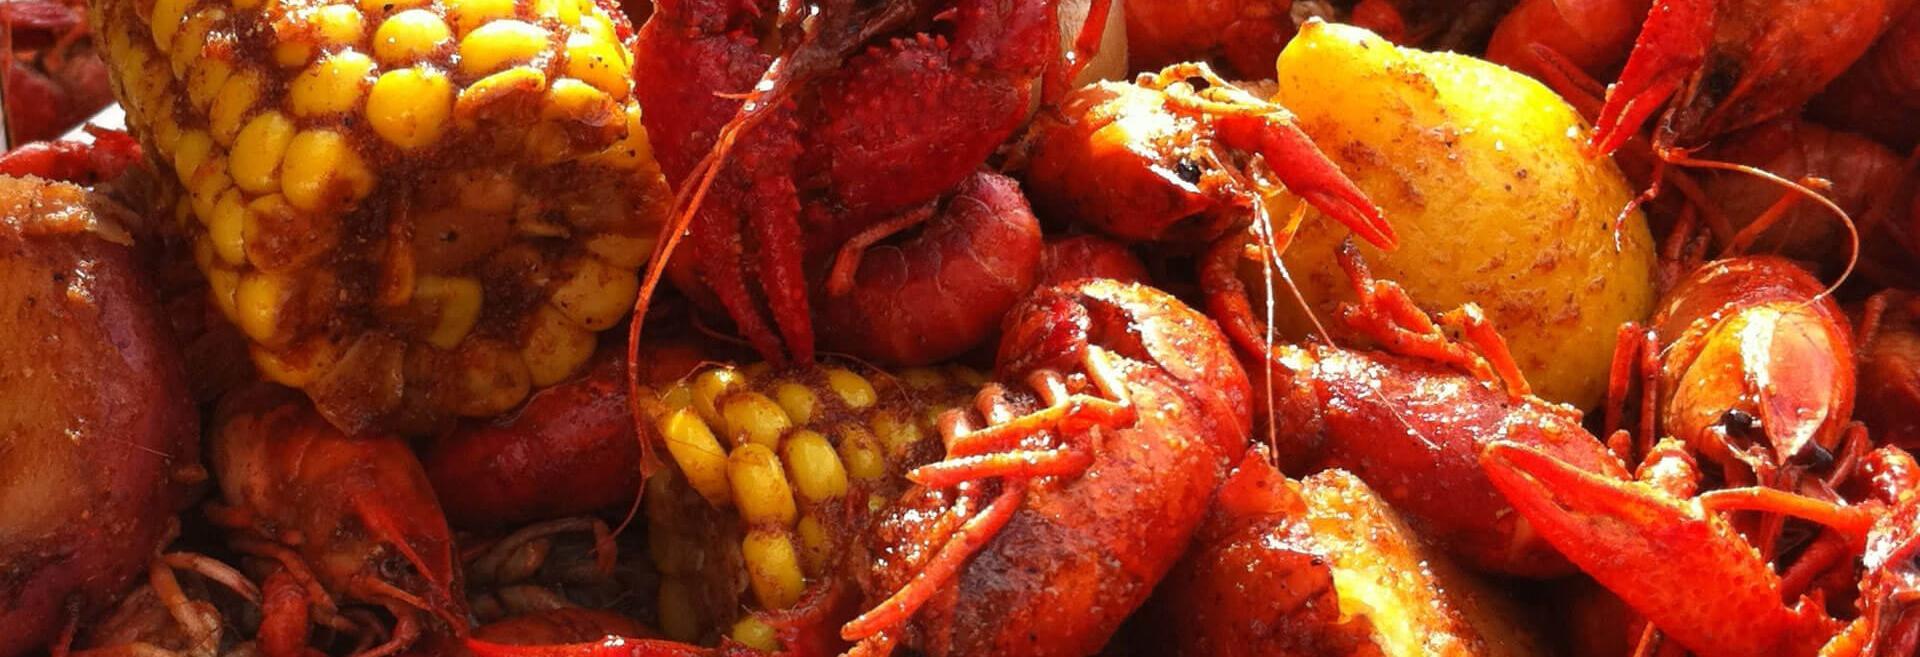 Tasty Crab House banner Austell, GA